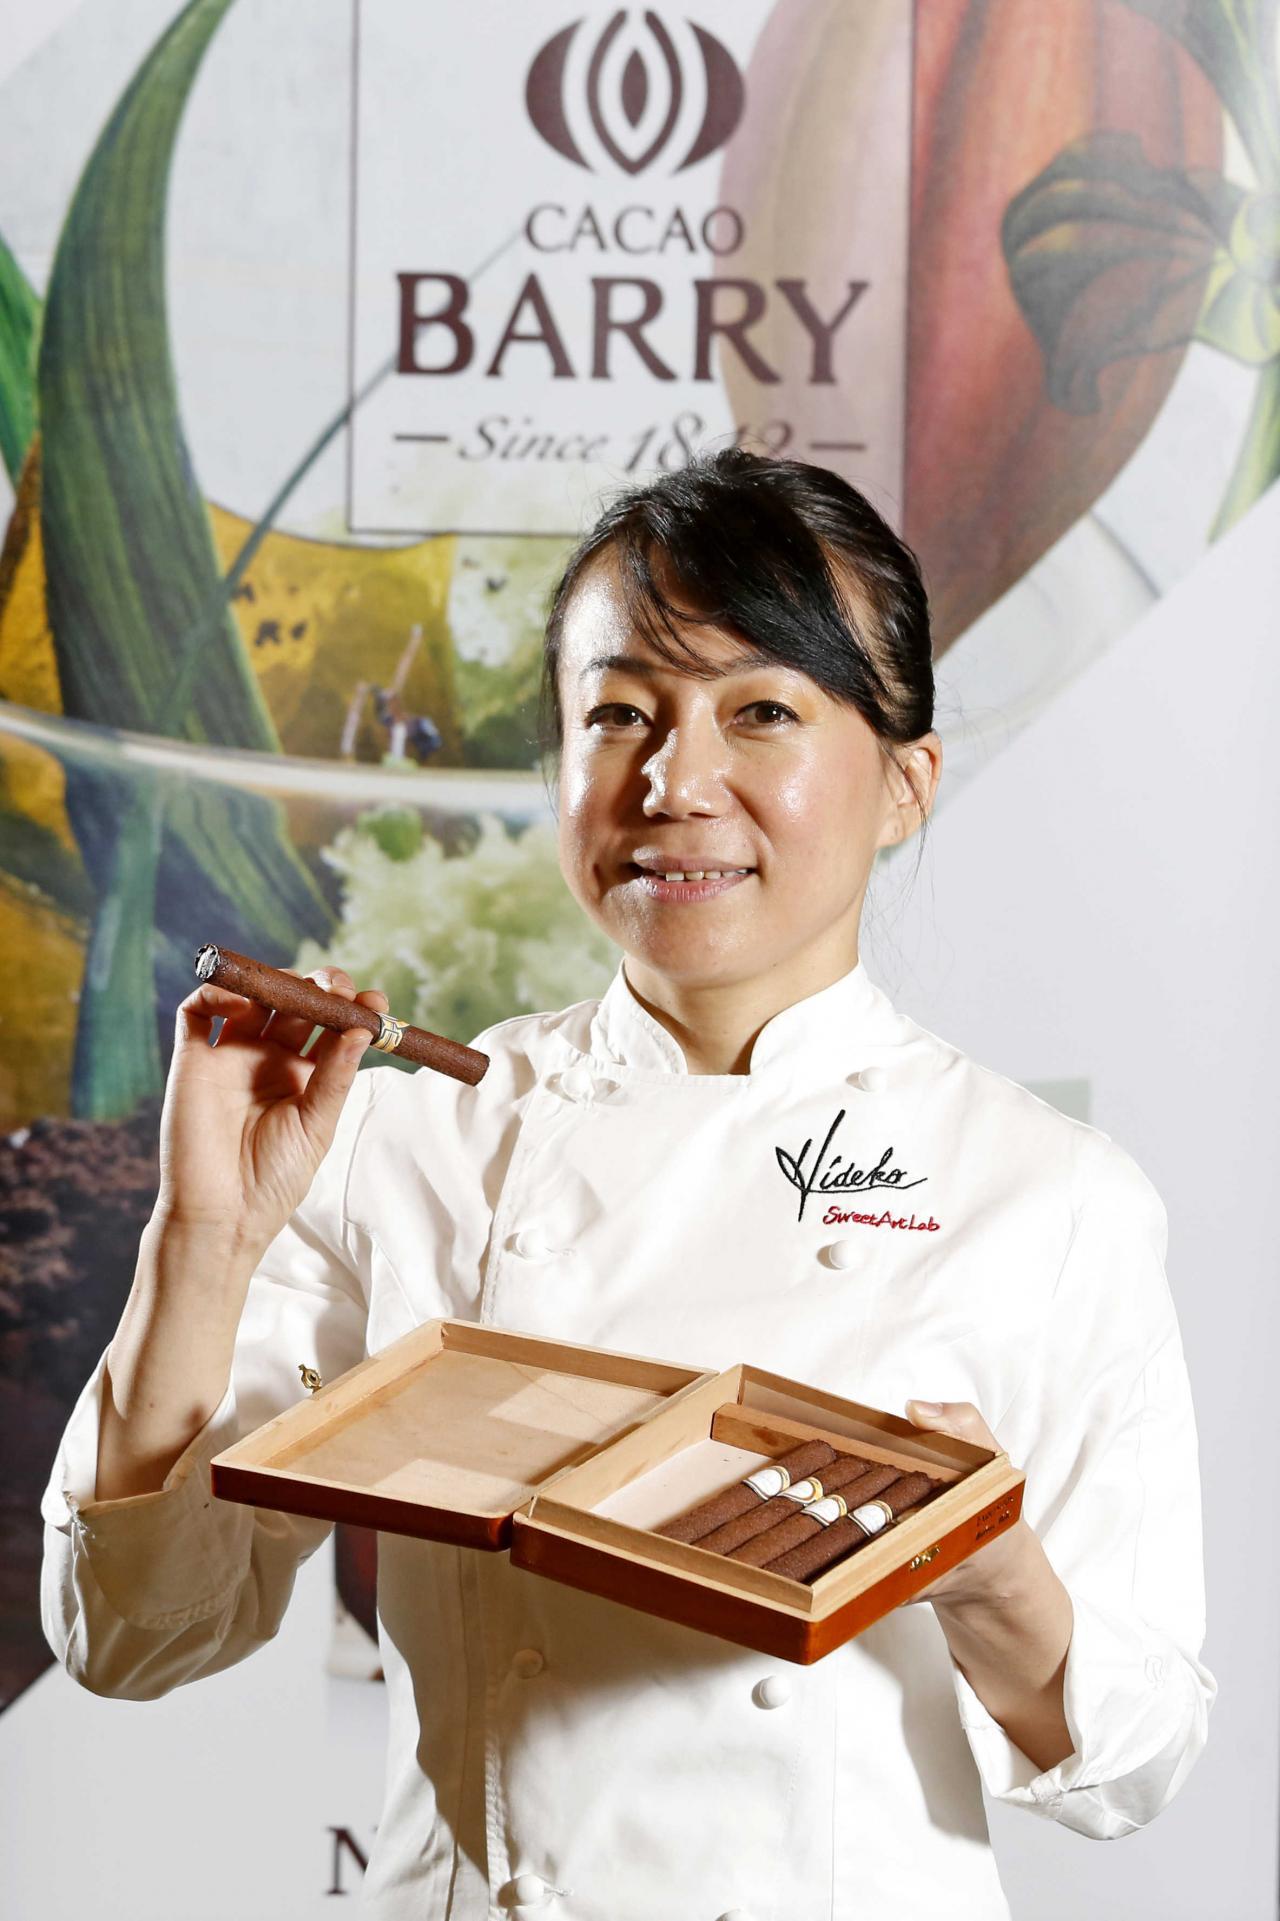 Hideko Kawa. Photo: Cacao Barry